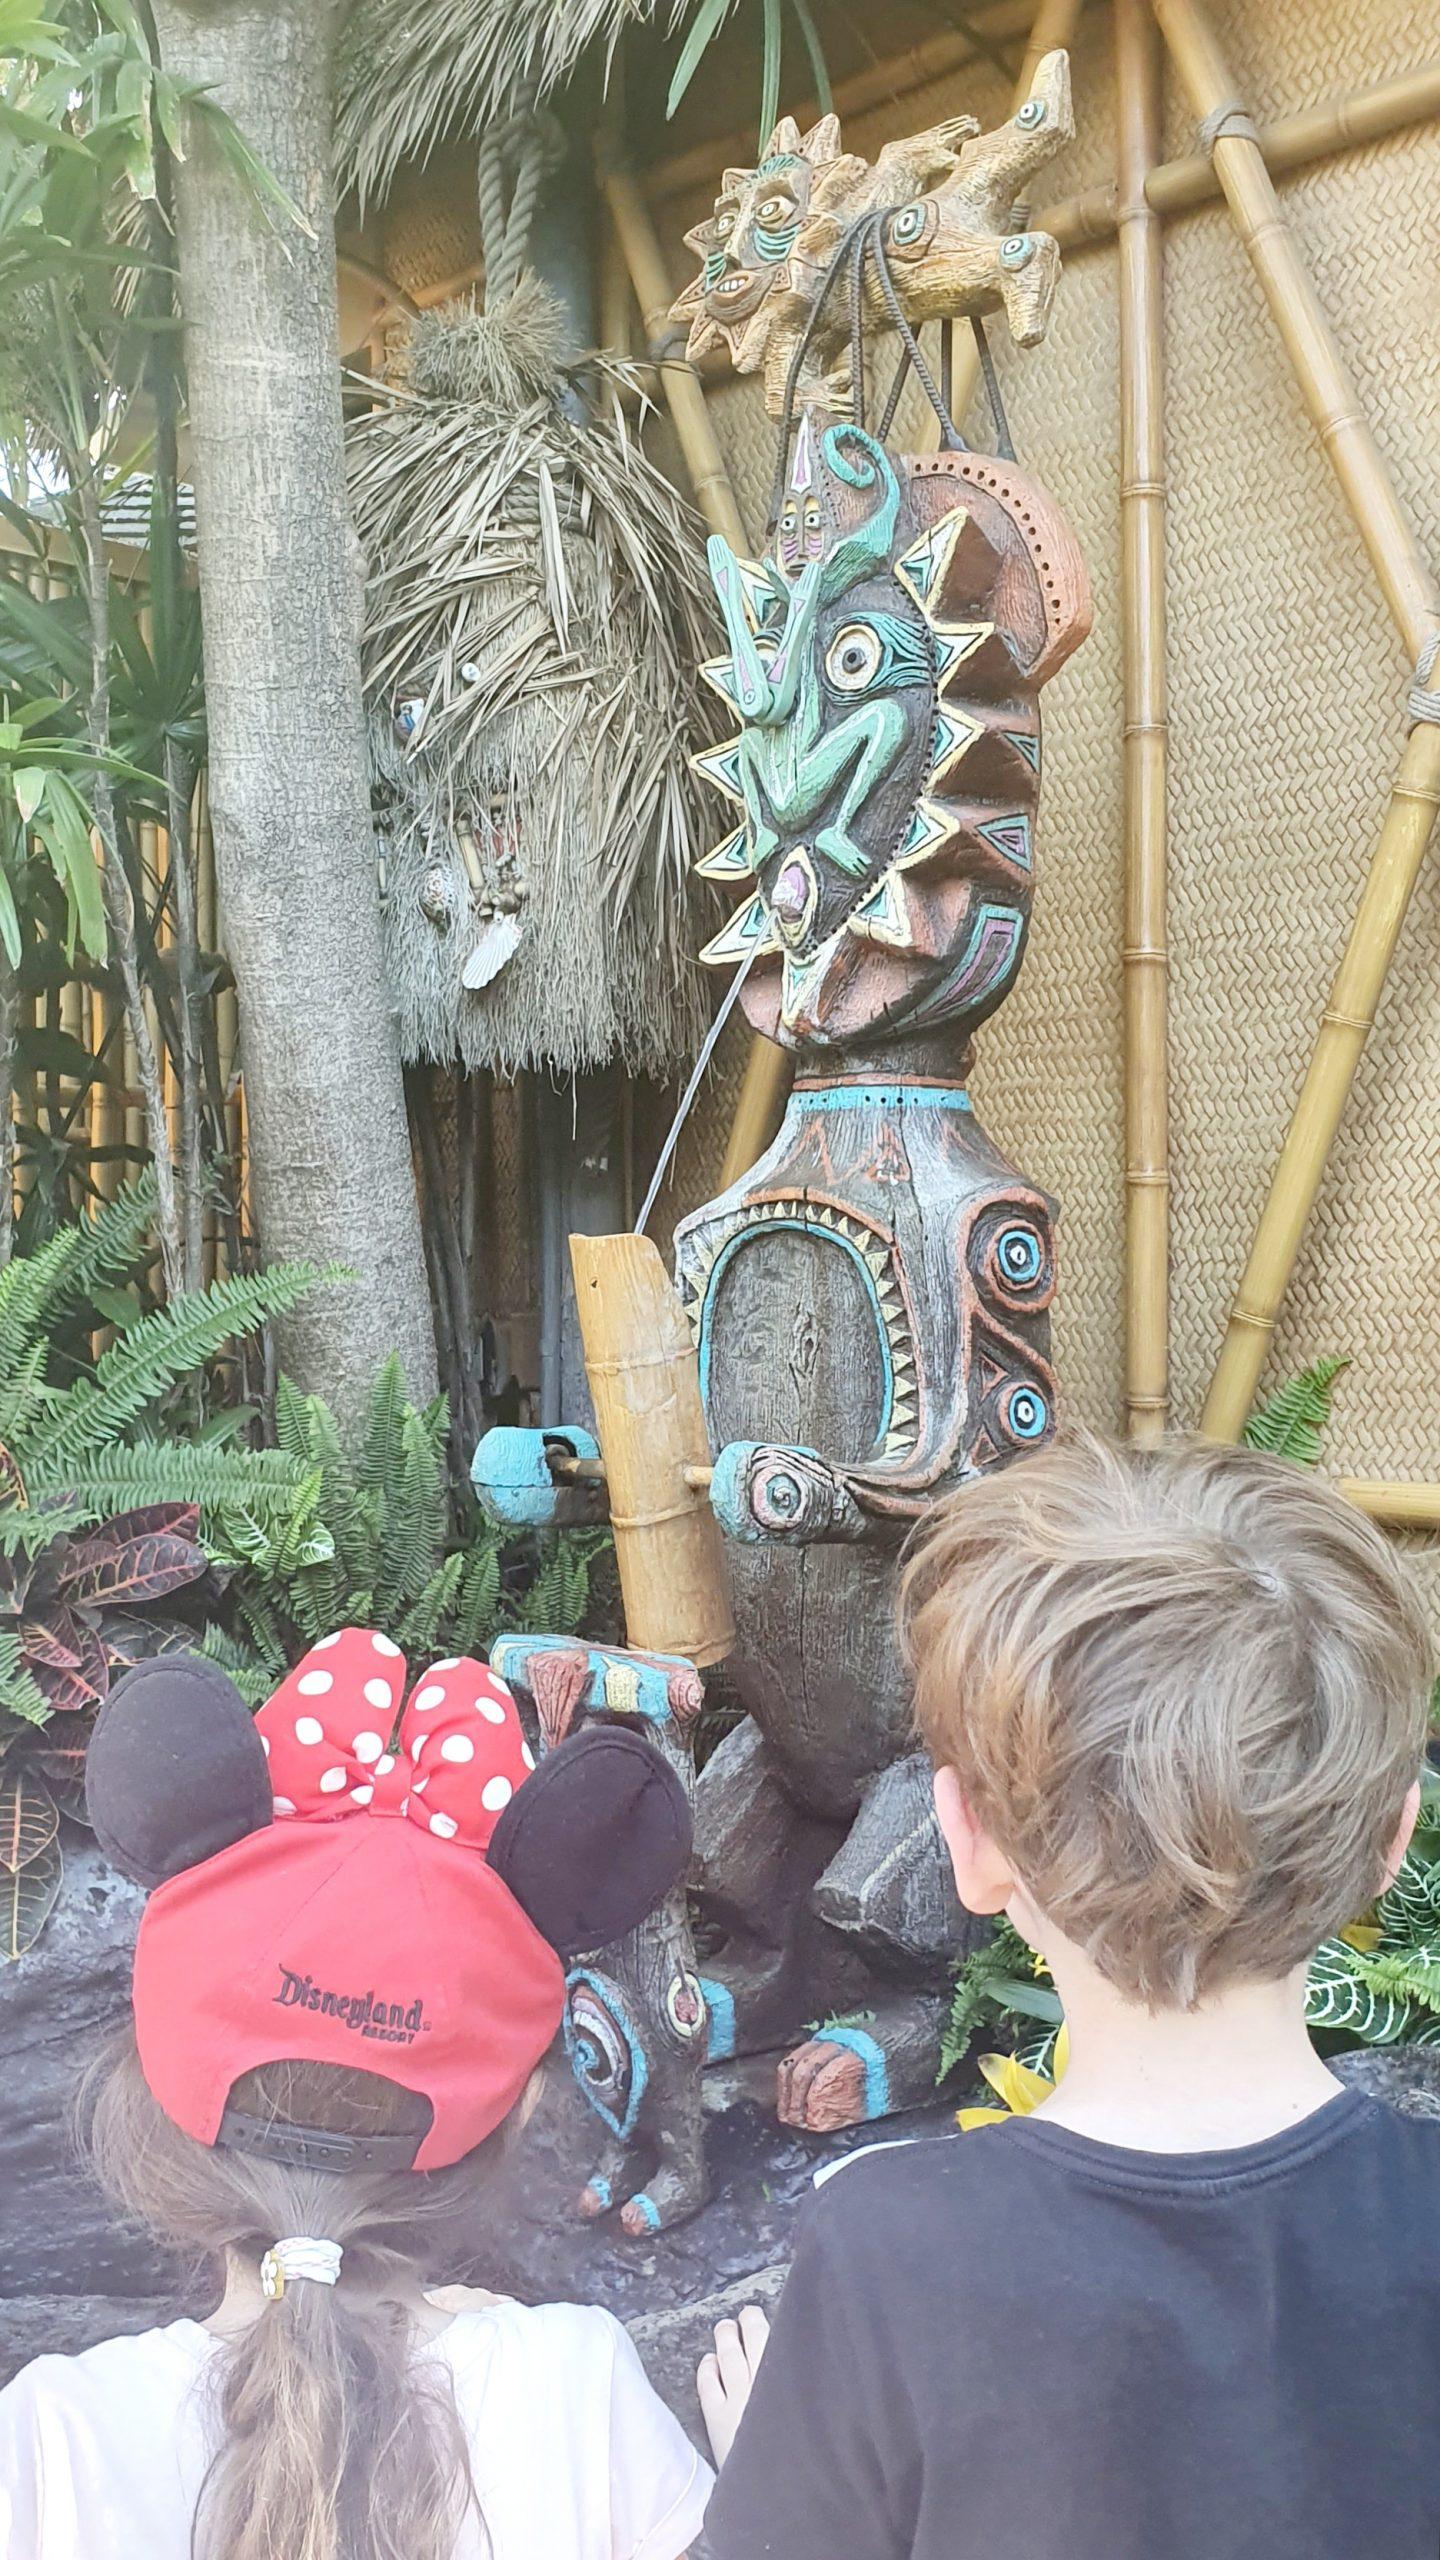 Disneyland Adventureland Enchanted Tiki Room